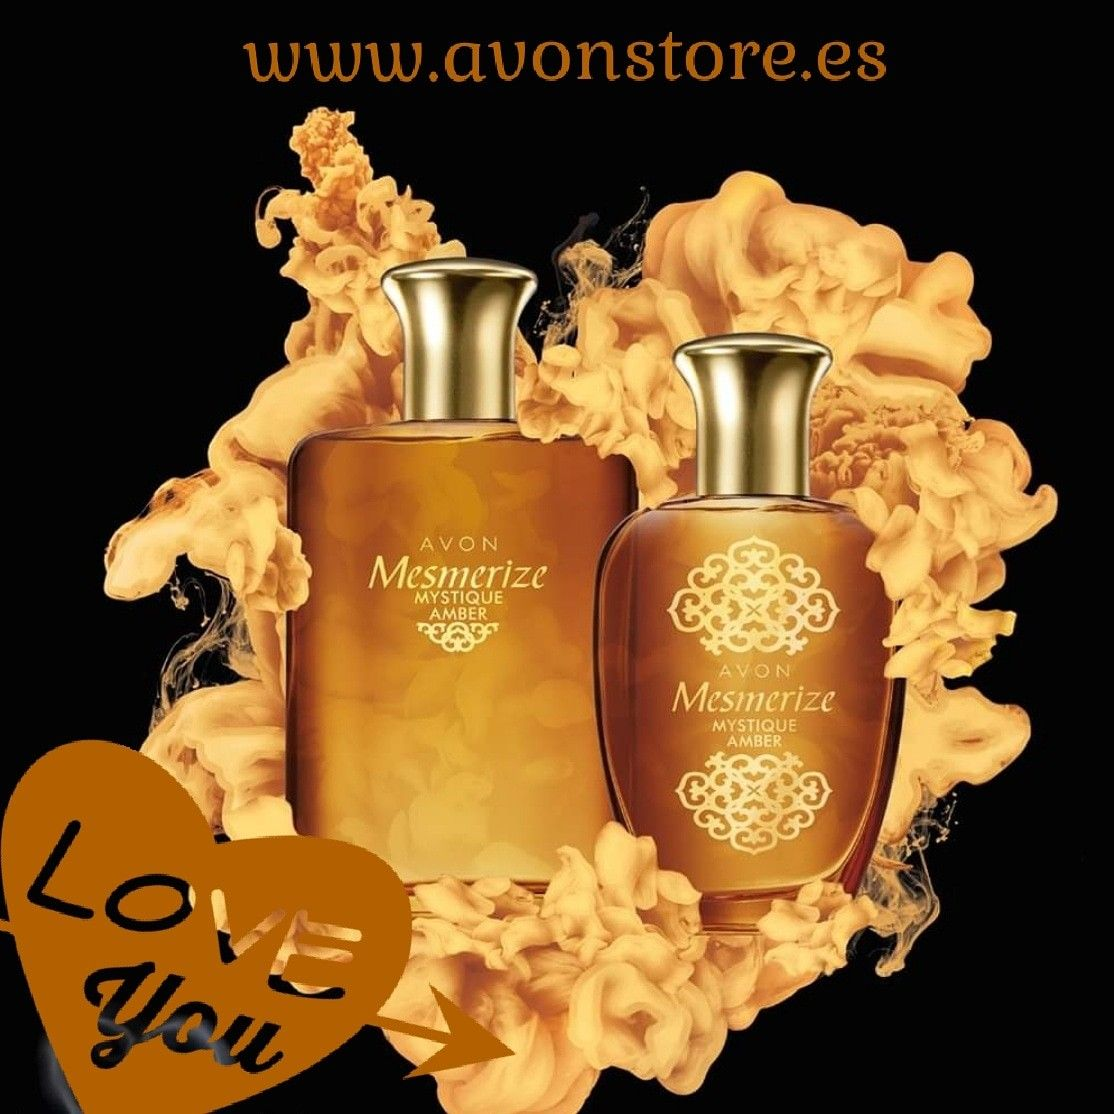 Mesmerize Mistique Amber en 2020 | Perfumes avon, Avon